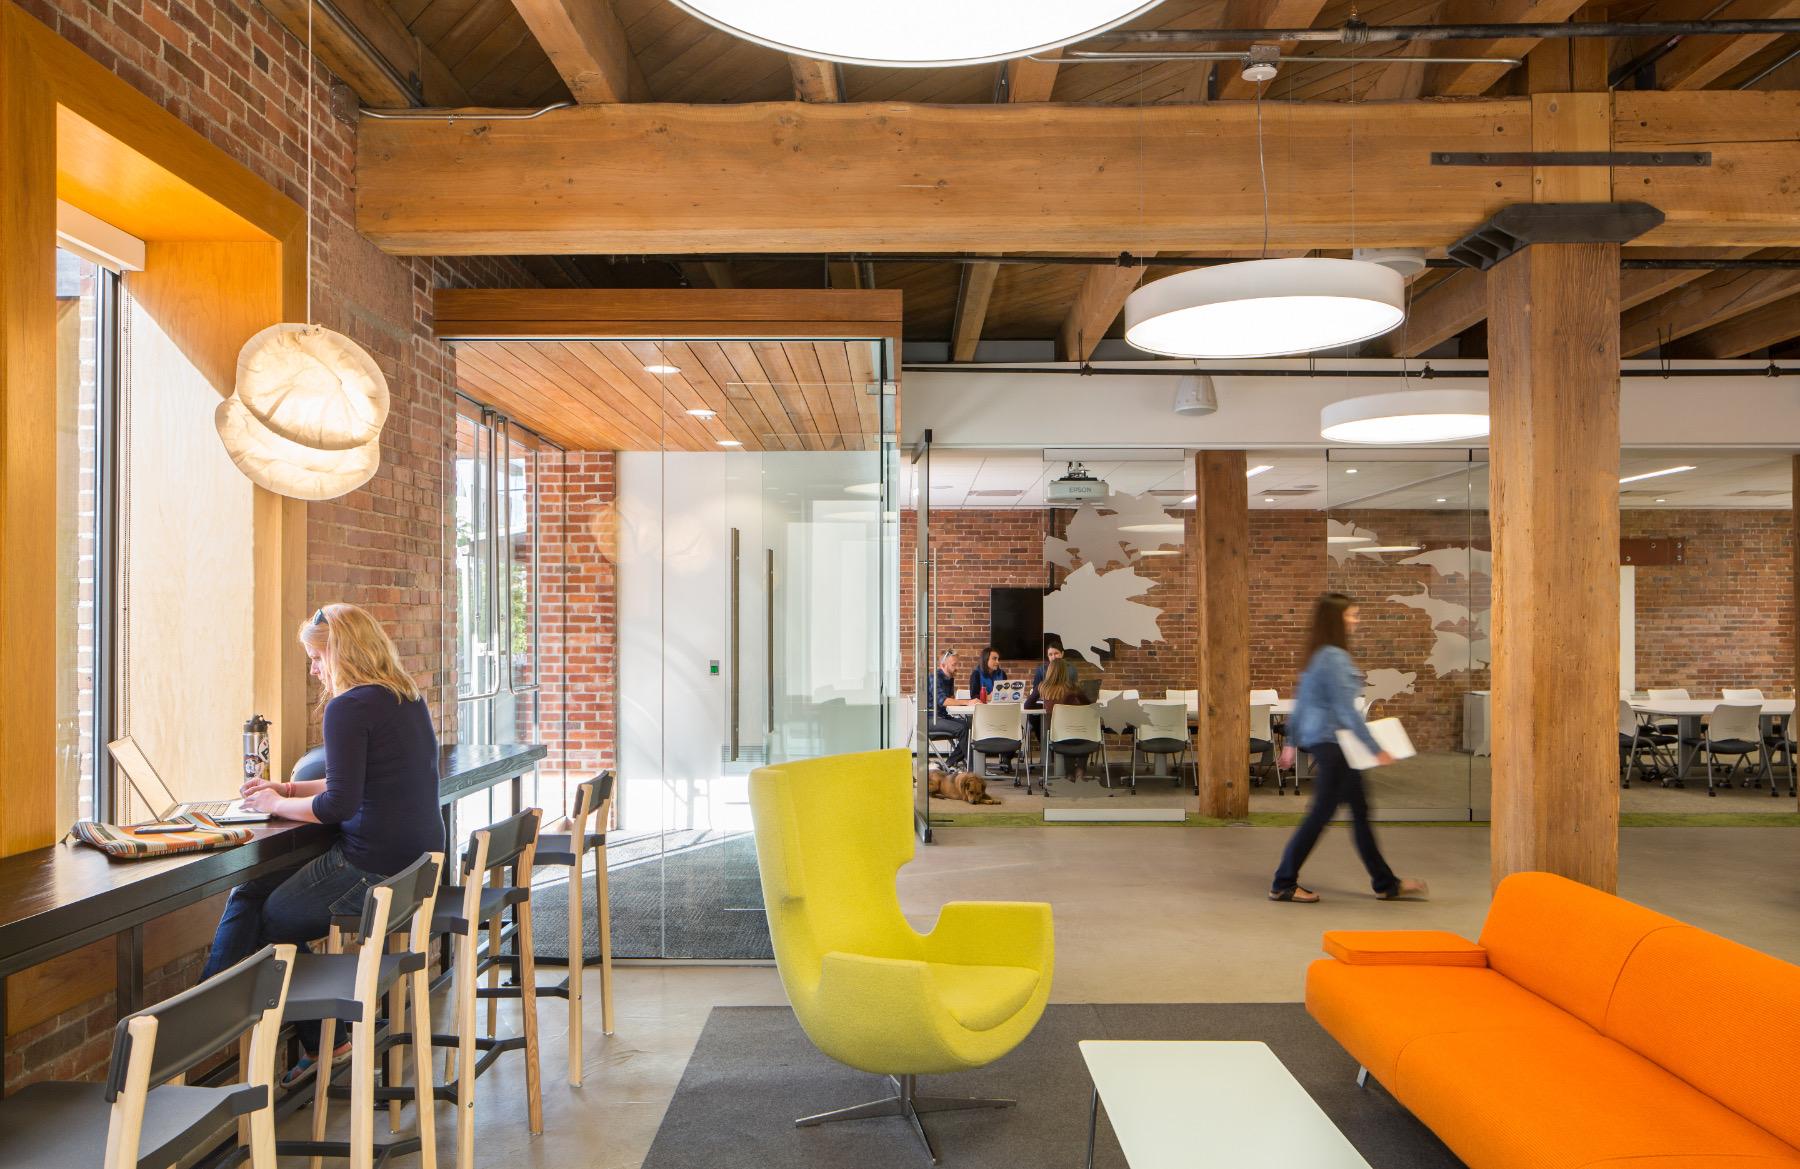 A Peek Inside The Alliance Center's Denver Coworking Space